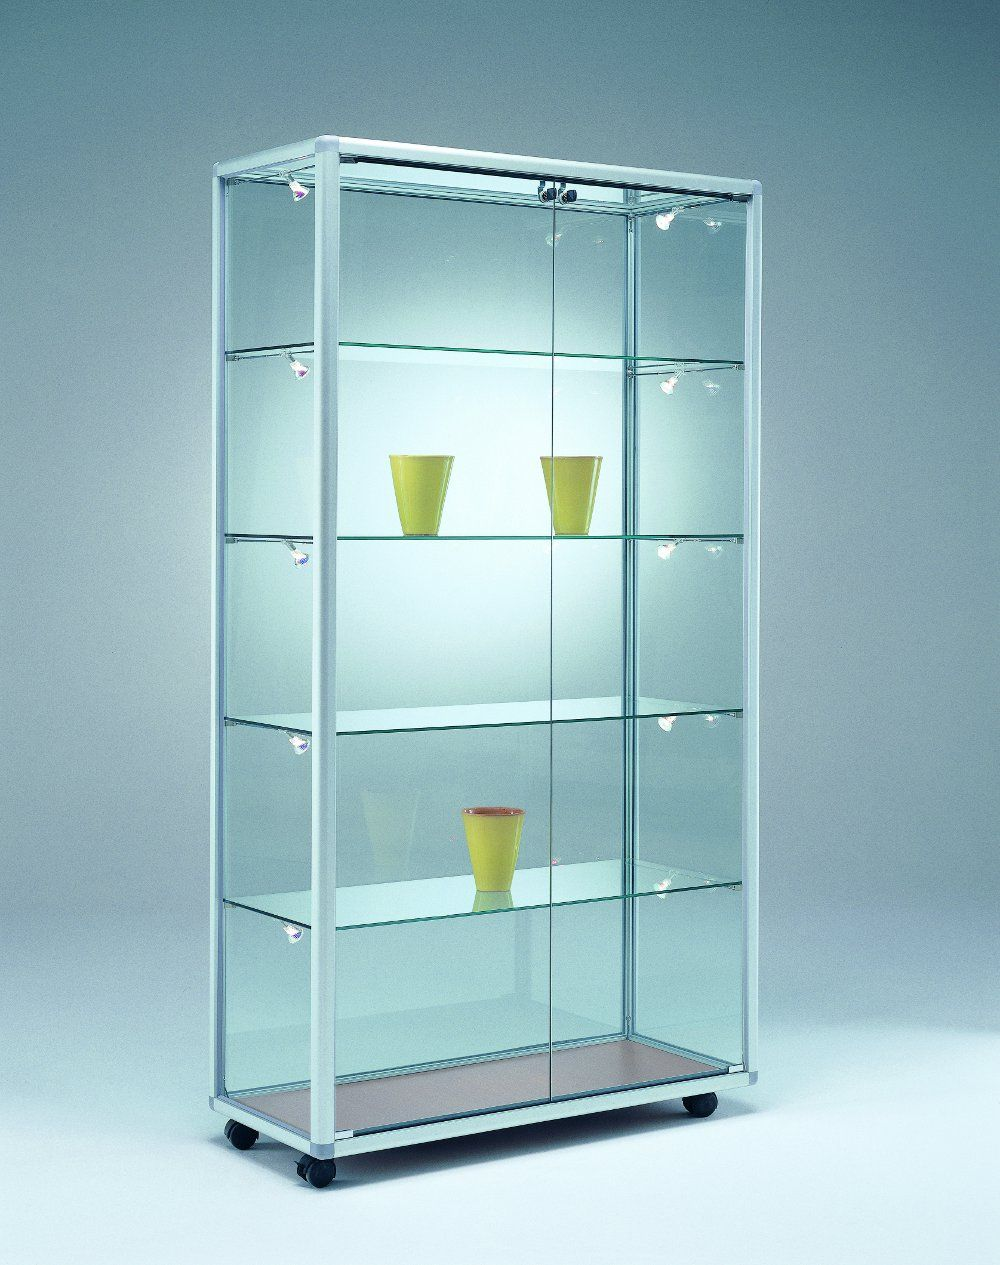 glasvitrine 99x52 5x184 5 cm vitrine pinterest glasvitrinen schaukasten und vitrine. Black Bedroom Furniture Sets. Home Design Ideas